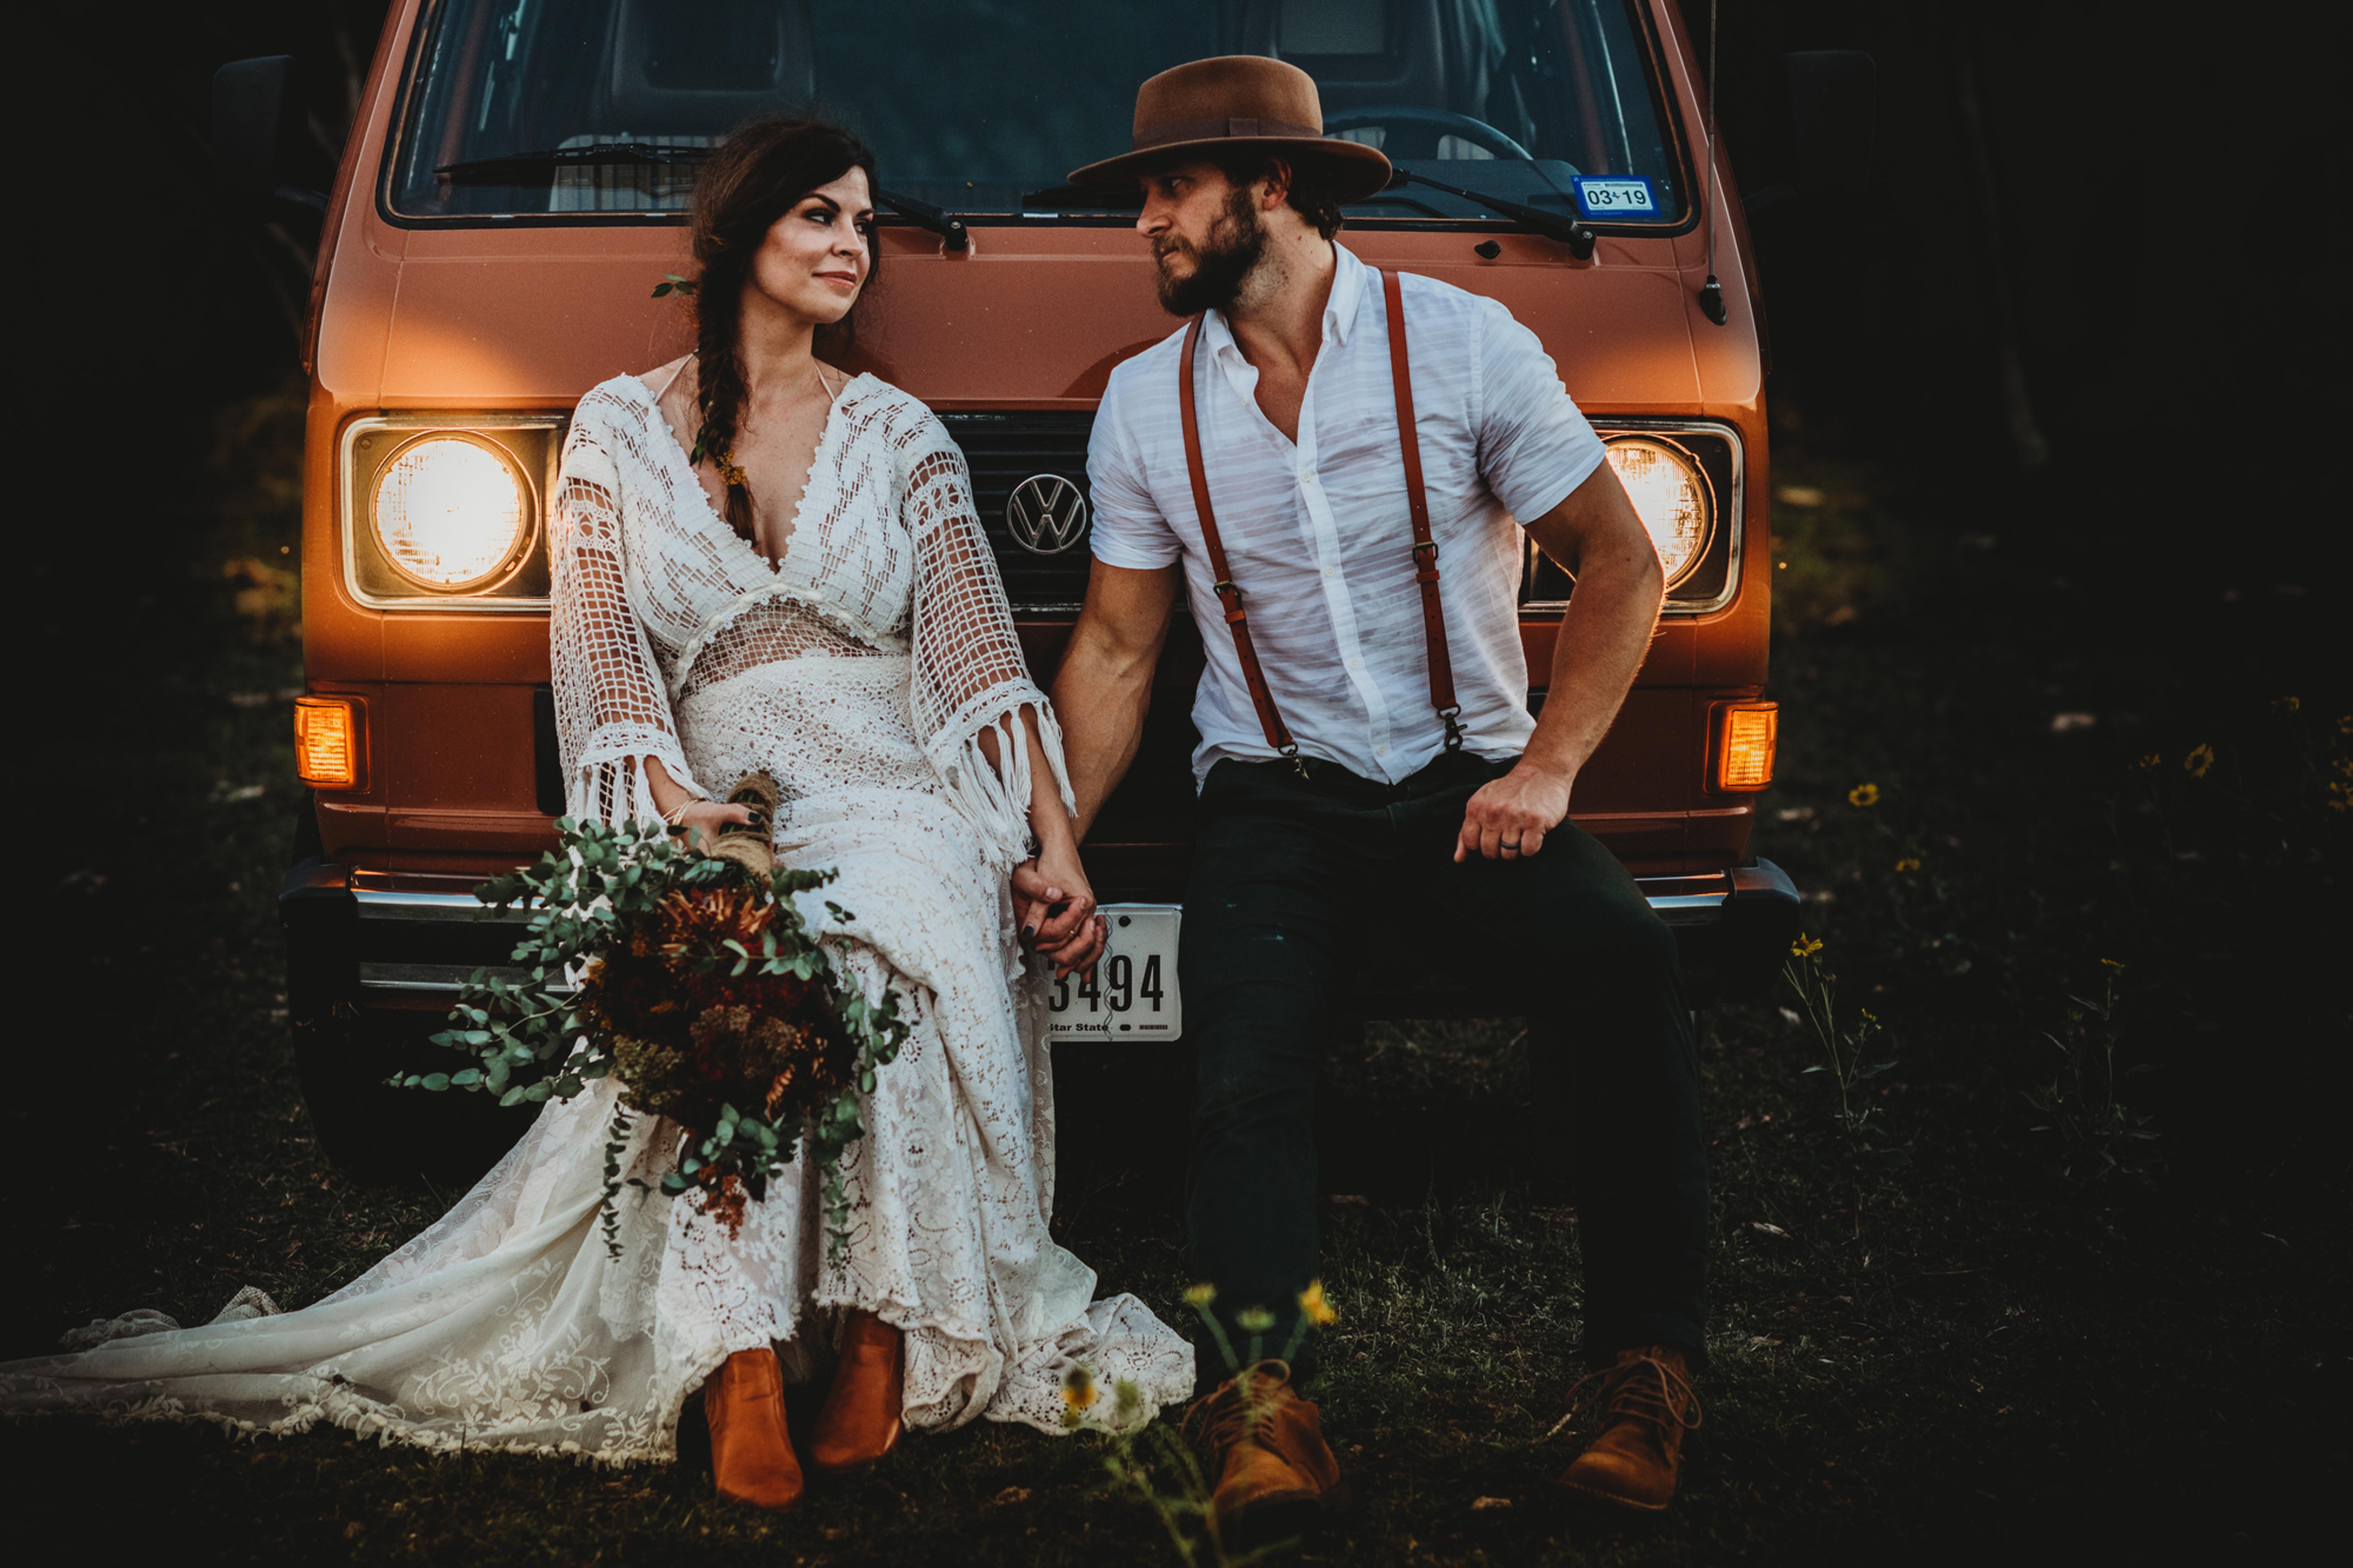 Wedding Videography (Full Day)